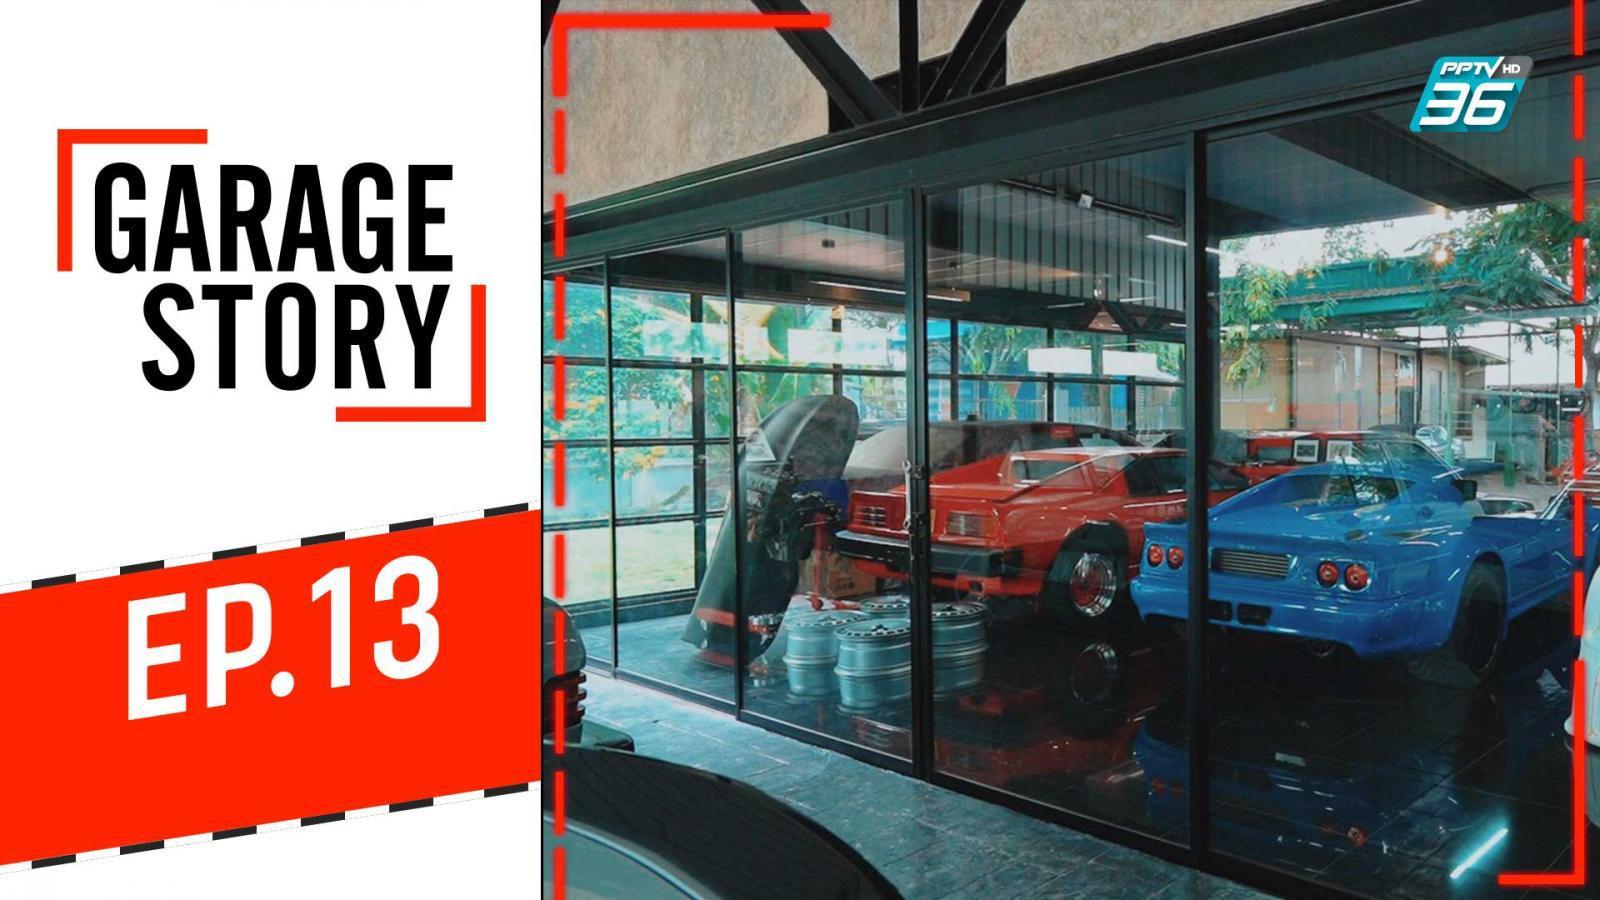 Garage ไอเดียจากโครงสร้างโรงเก็บเครื่องบิน